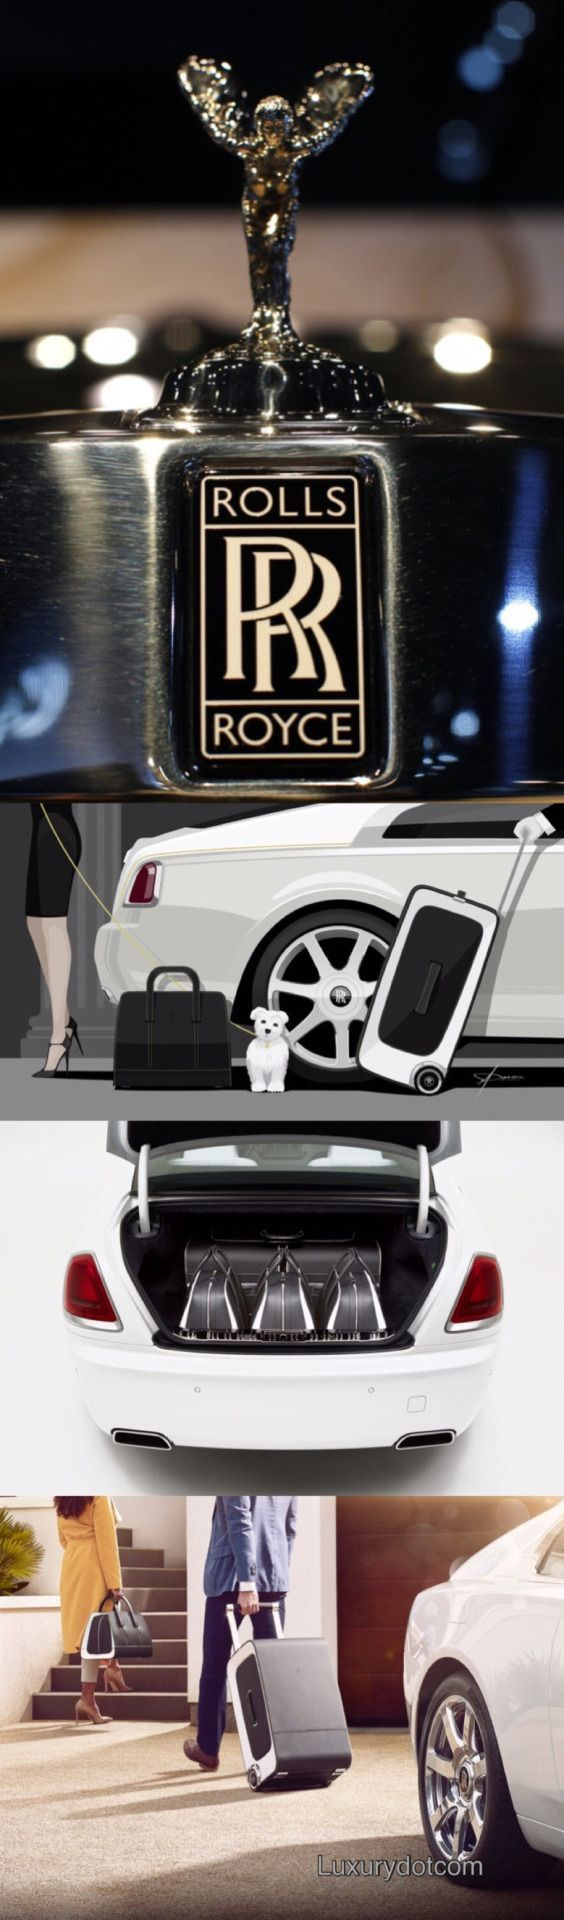 1000 ideas about rolls royce phantom interior on pinterest rolls royce phantom rolls royce. Black Bedroom Furniture Sets. Home Design Ideas